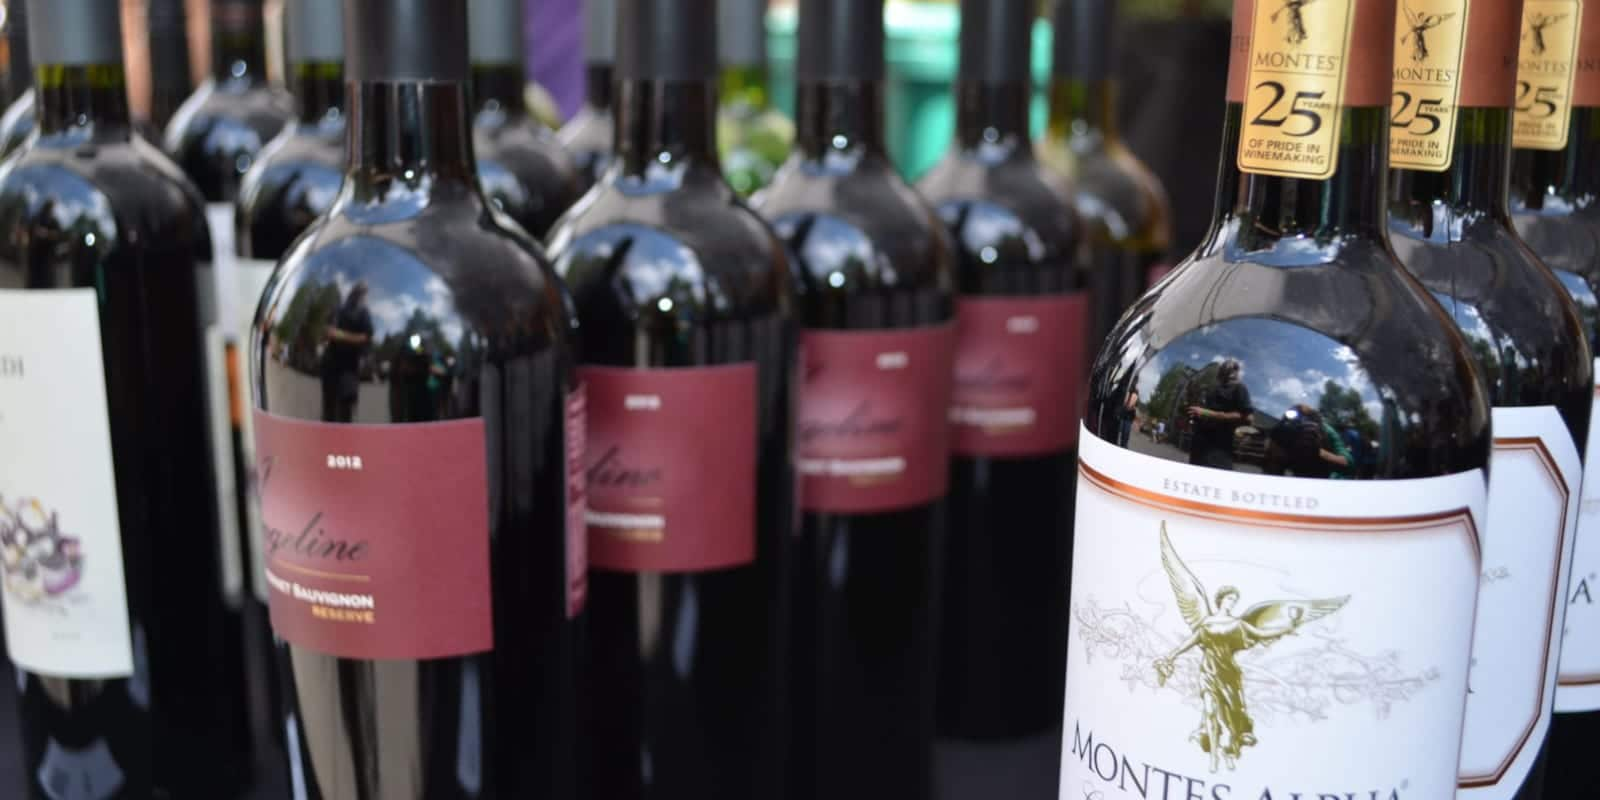 Keystone Wine and Jazz Festival Bottles